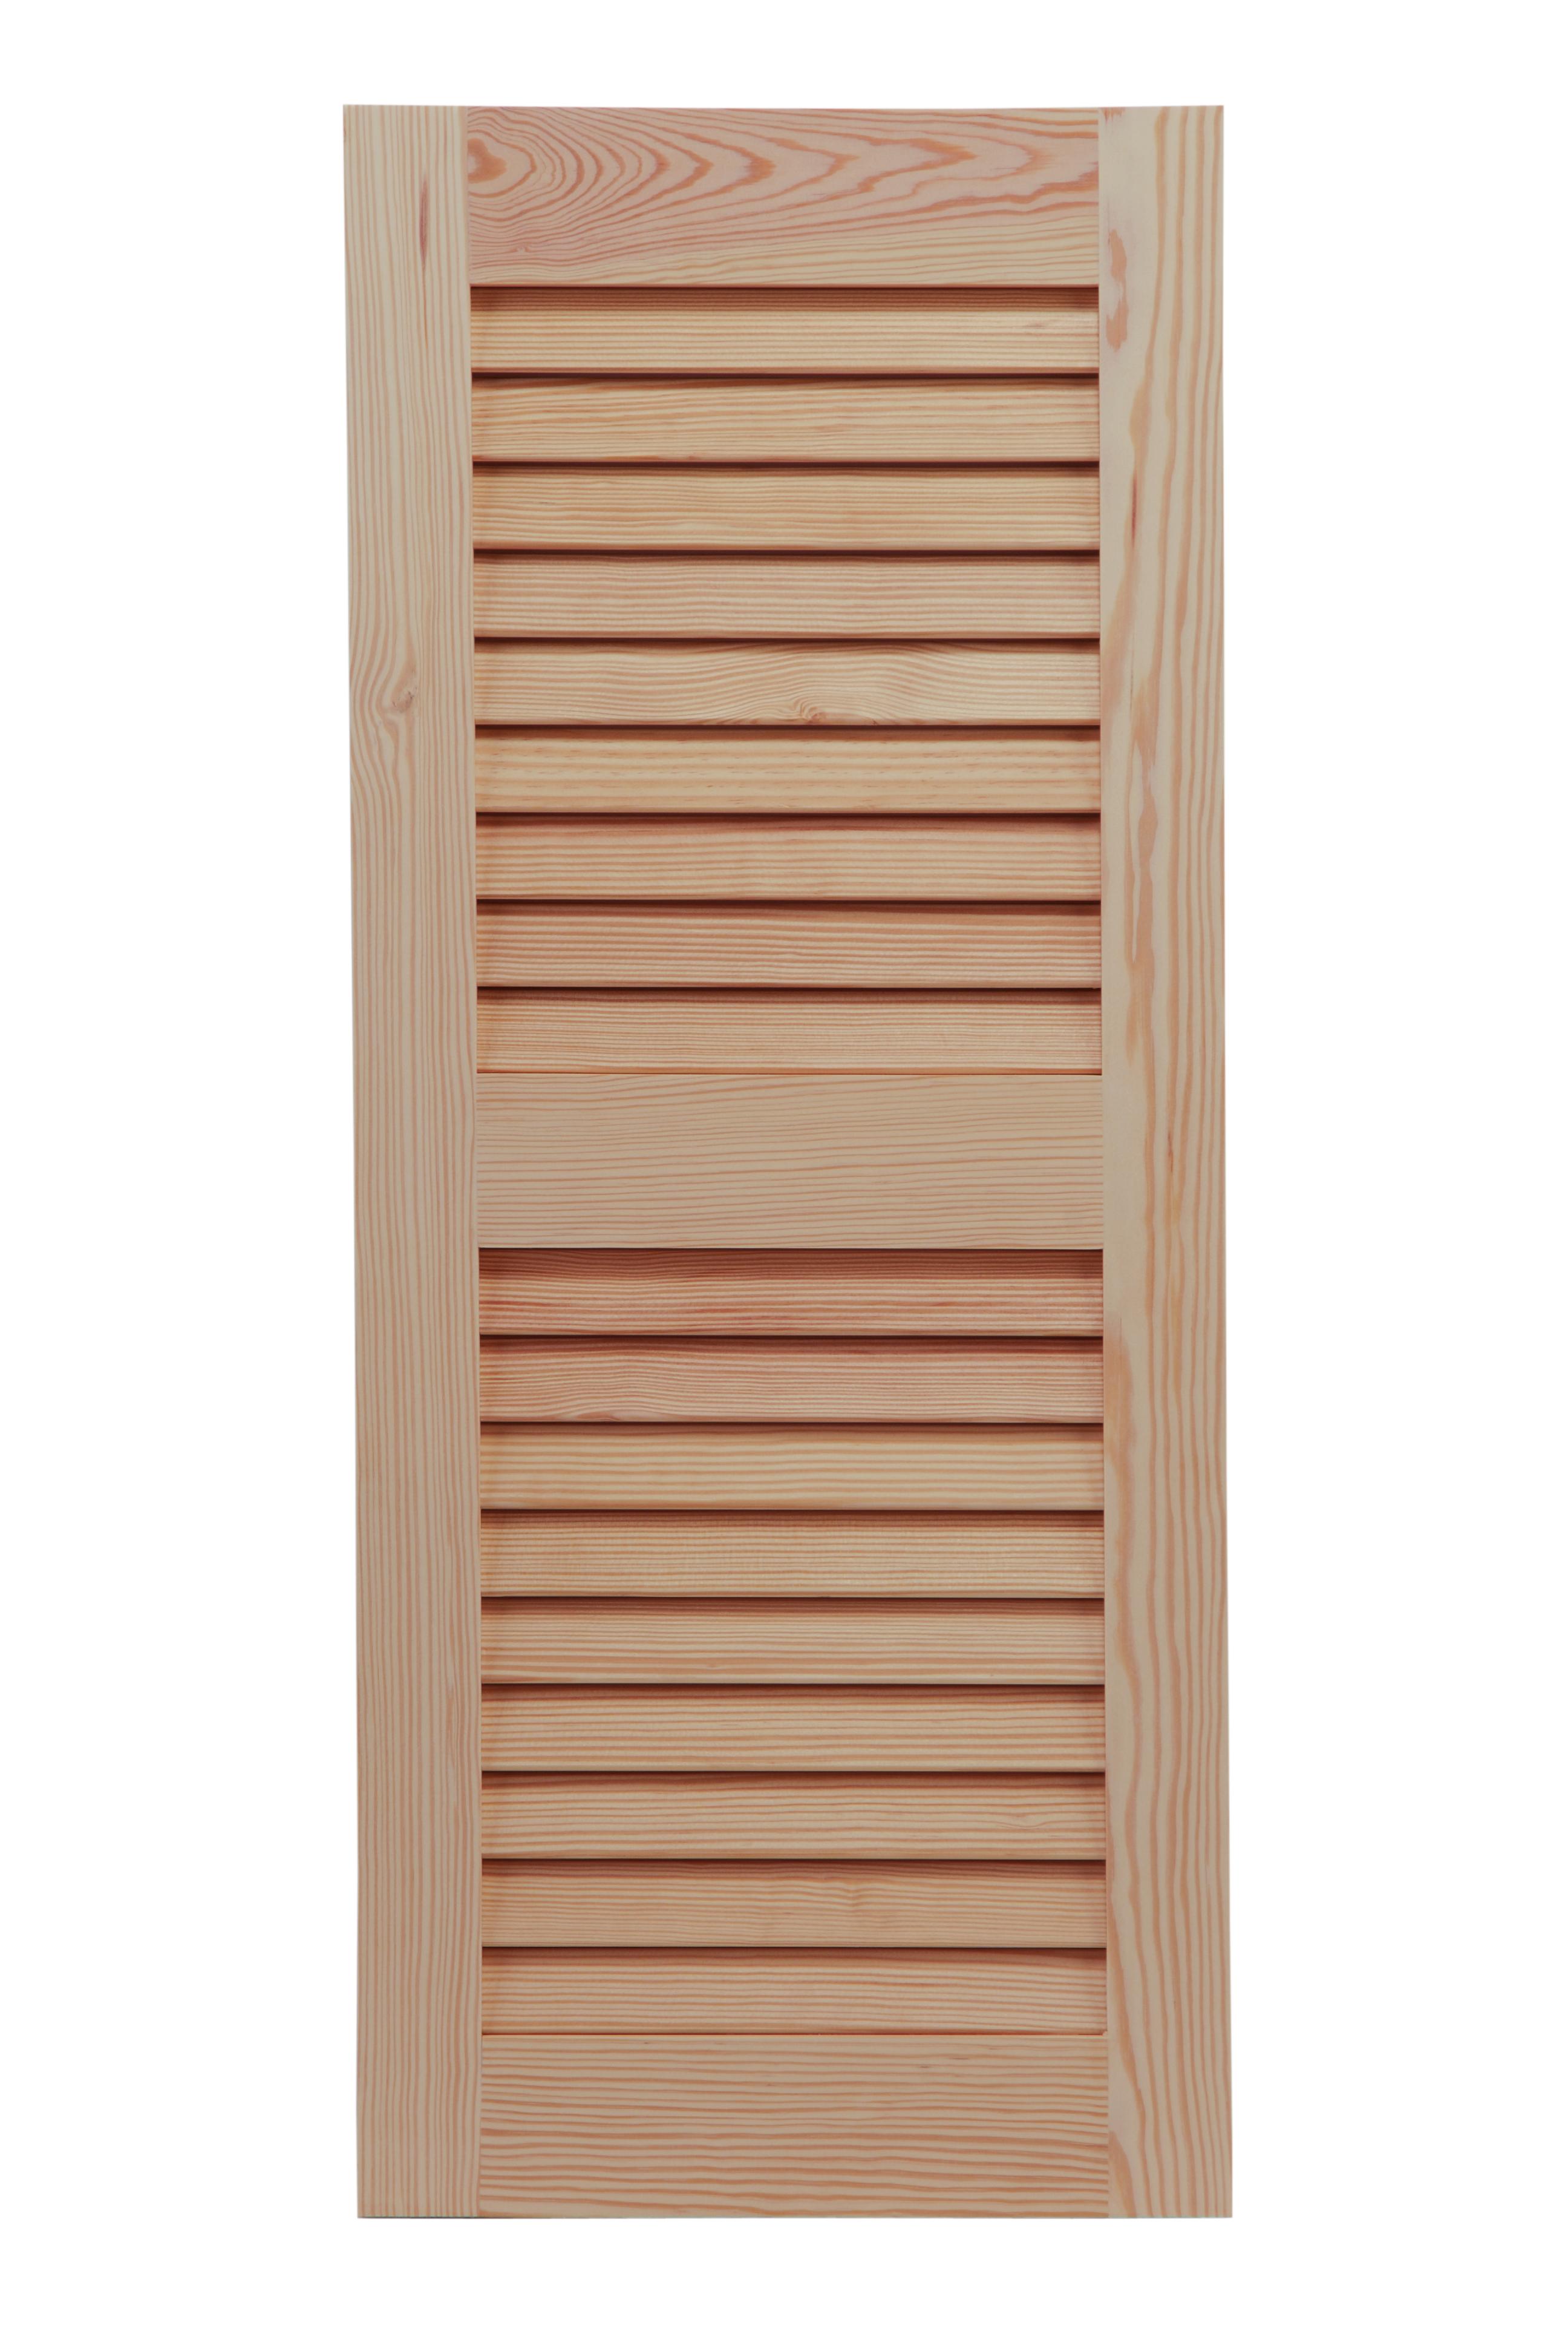 Custom Exterior Wood Shutters At Menards®